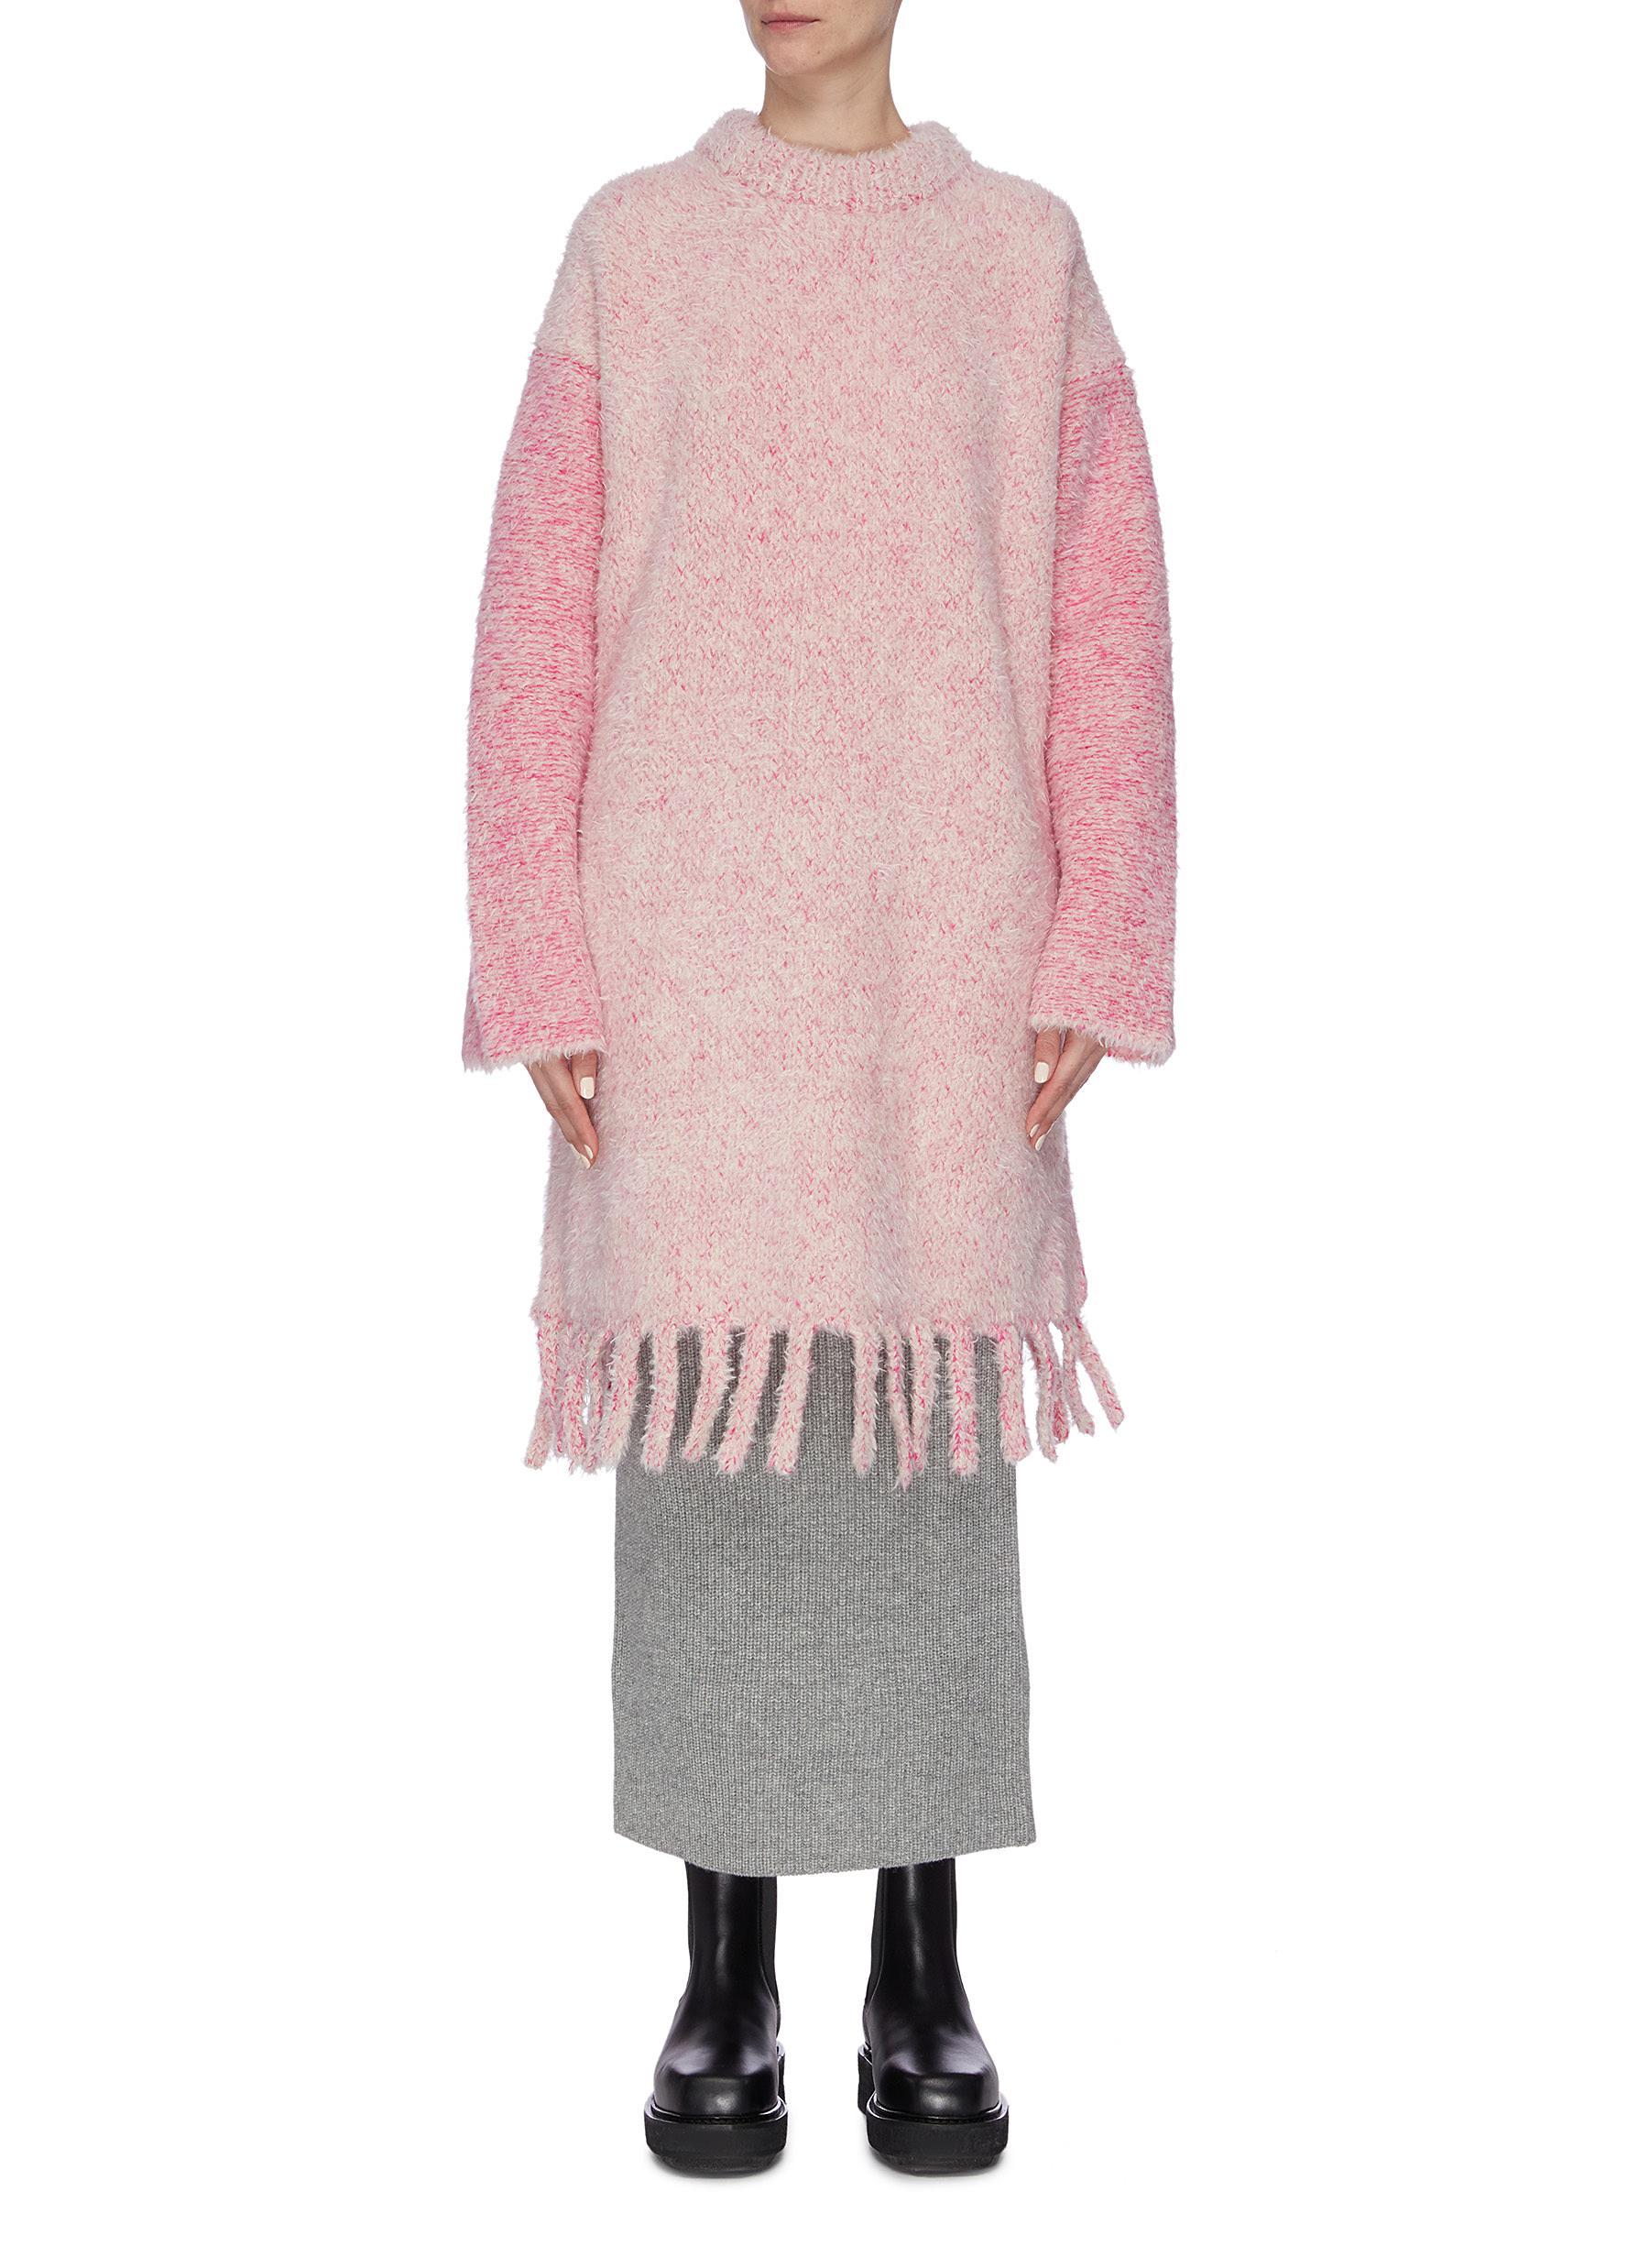 Colourblock sleeve tassel hem oversized sweater by Short Sentence